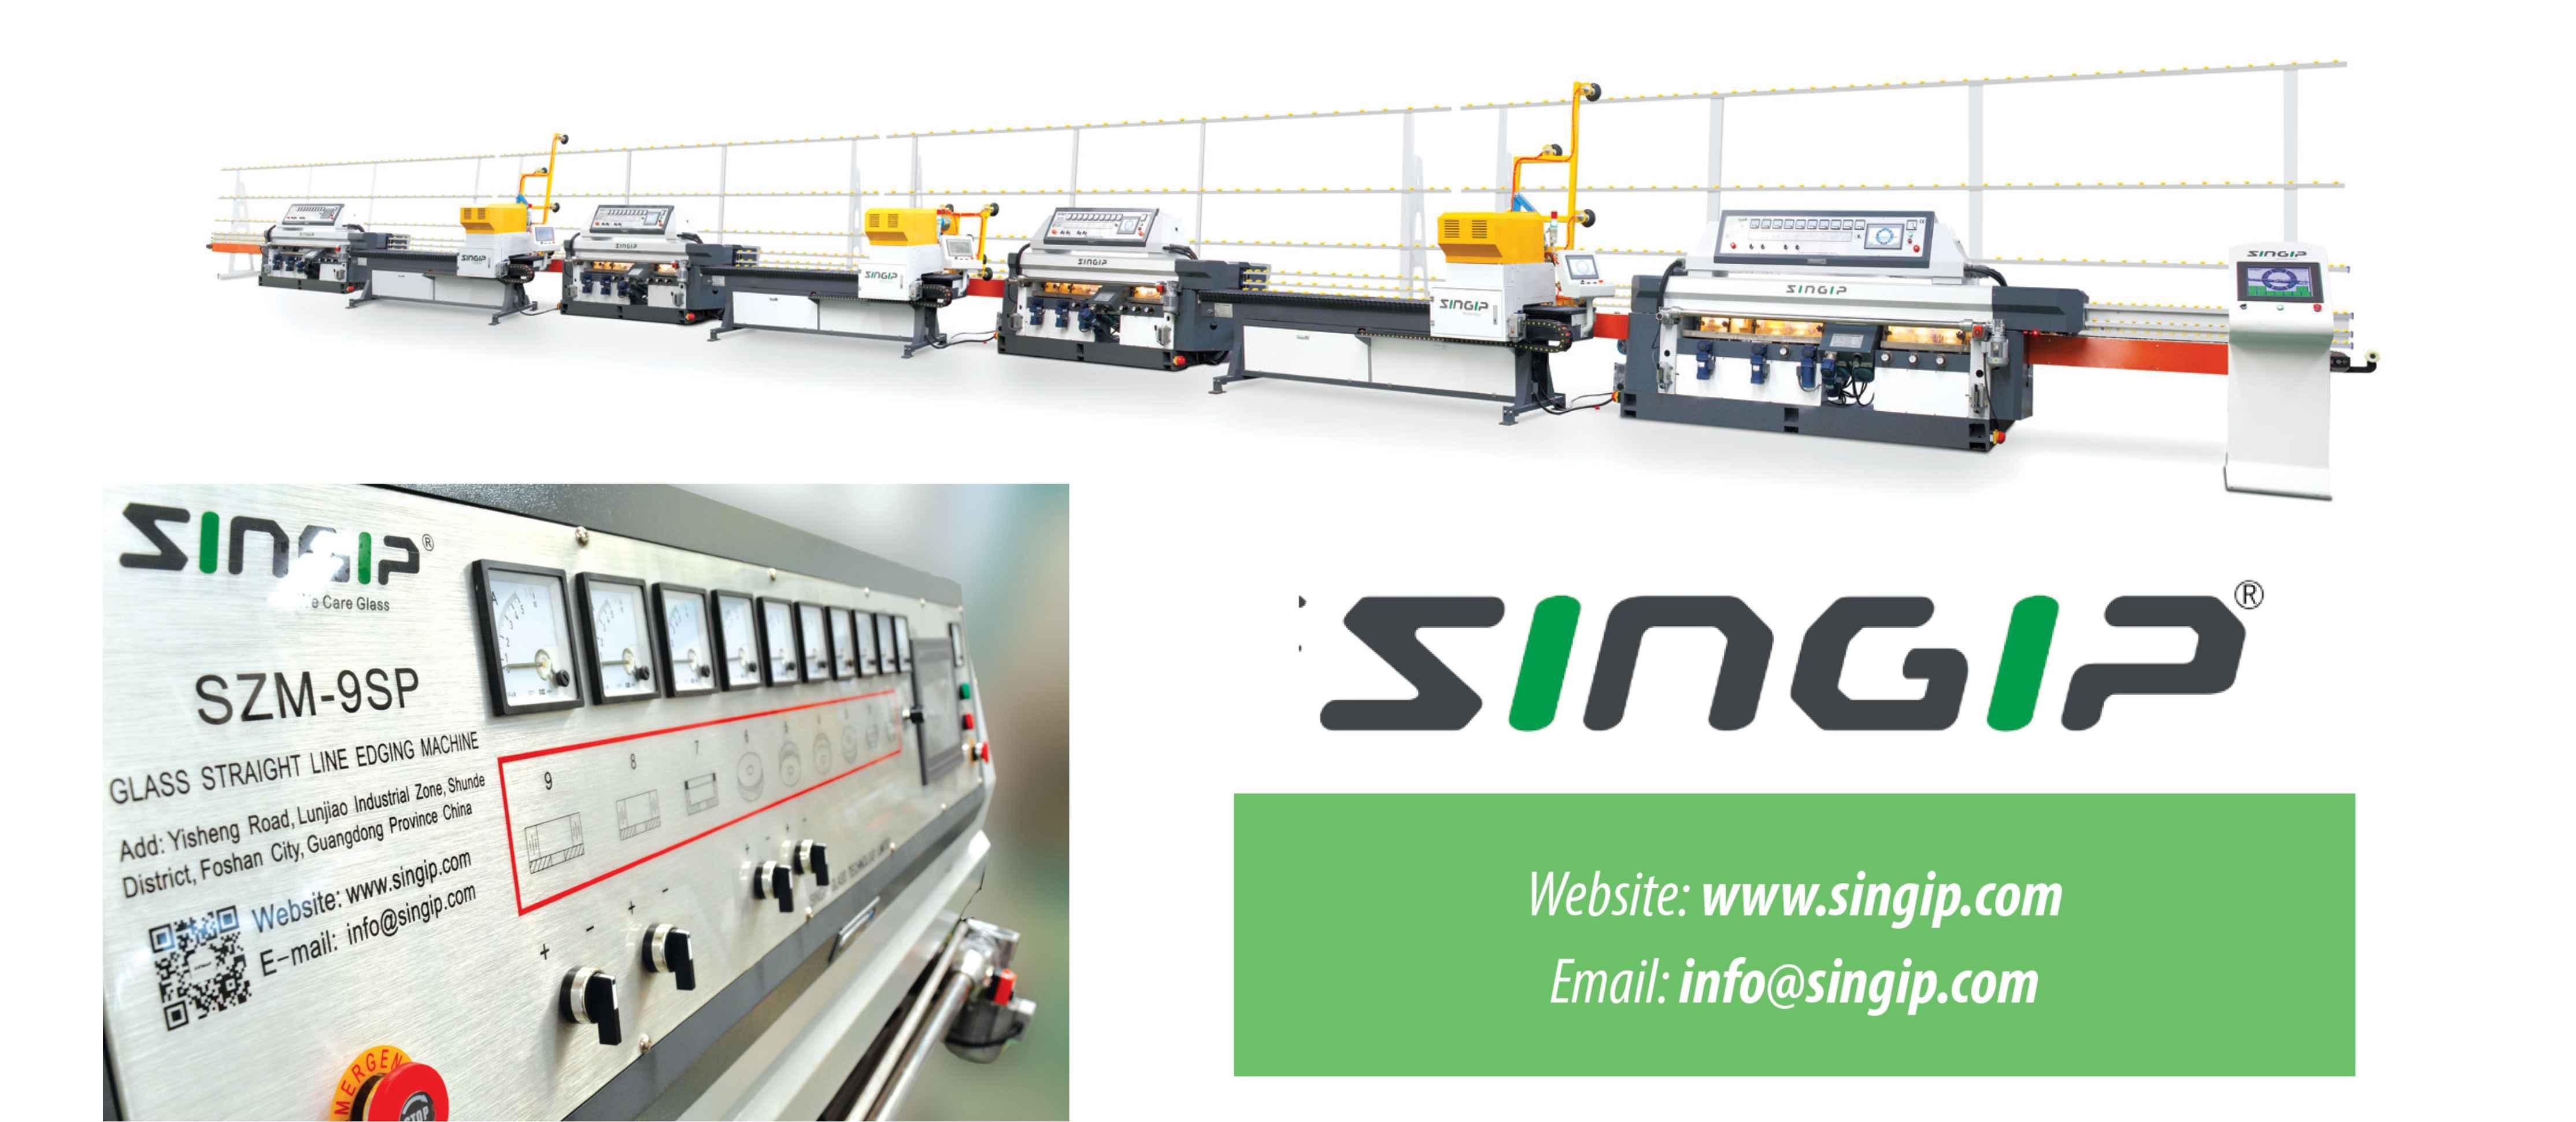 Singip's intelligent solution for edging machines